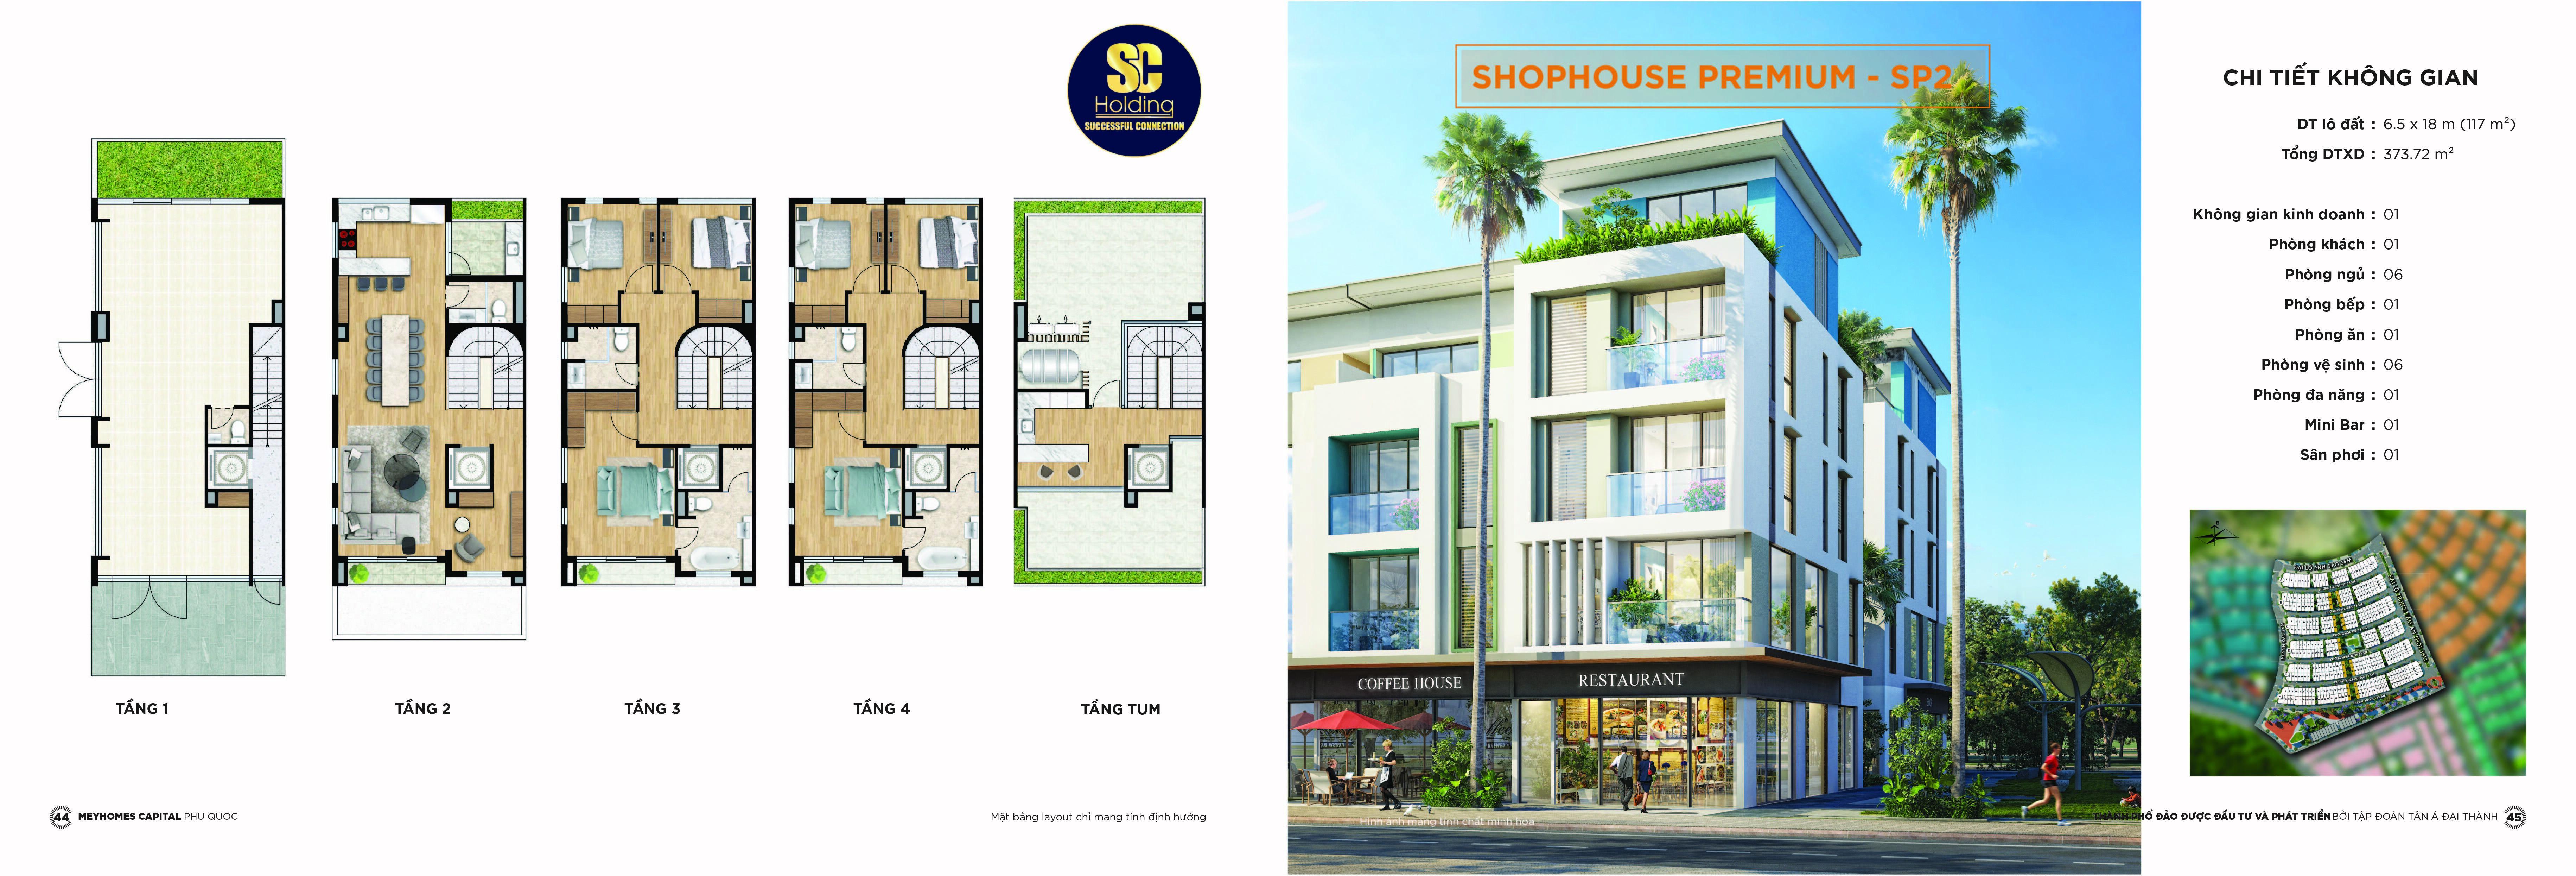 Shophouse Meyhomes Capital Phú Quốc